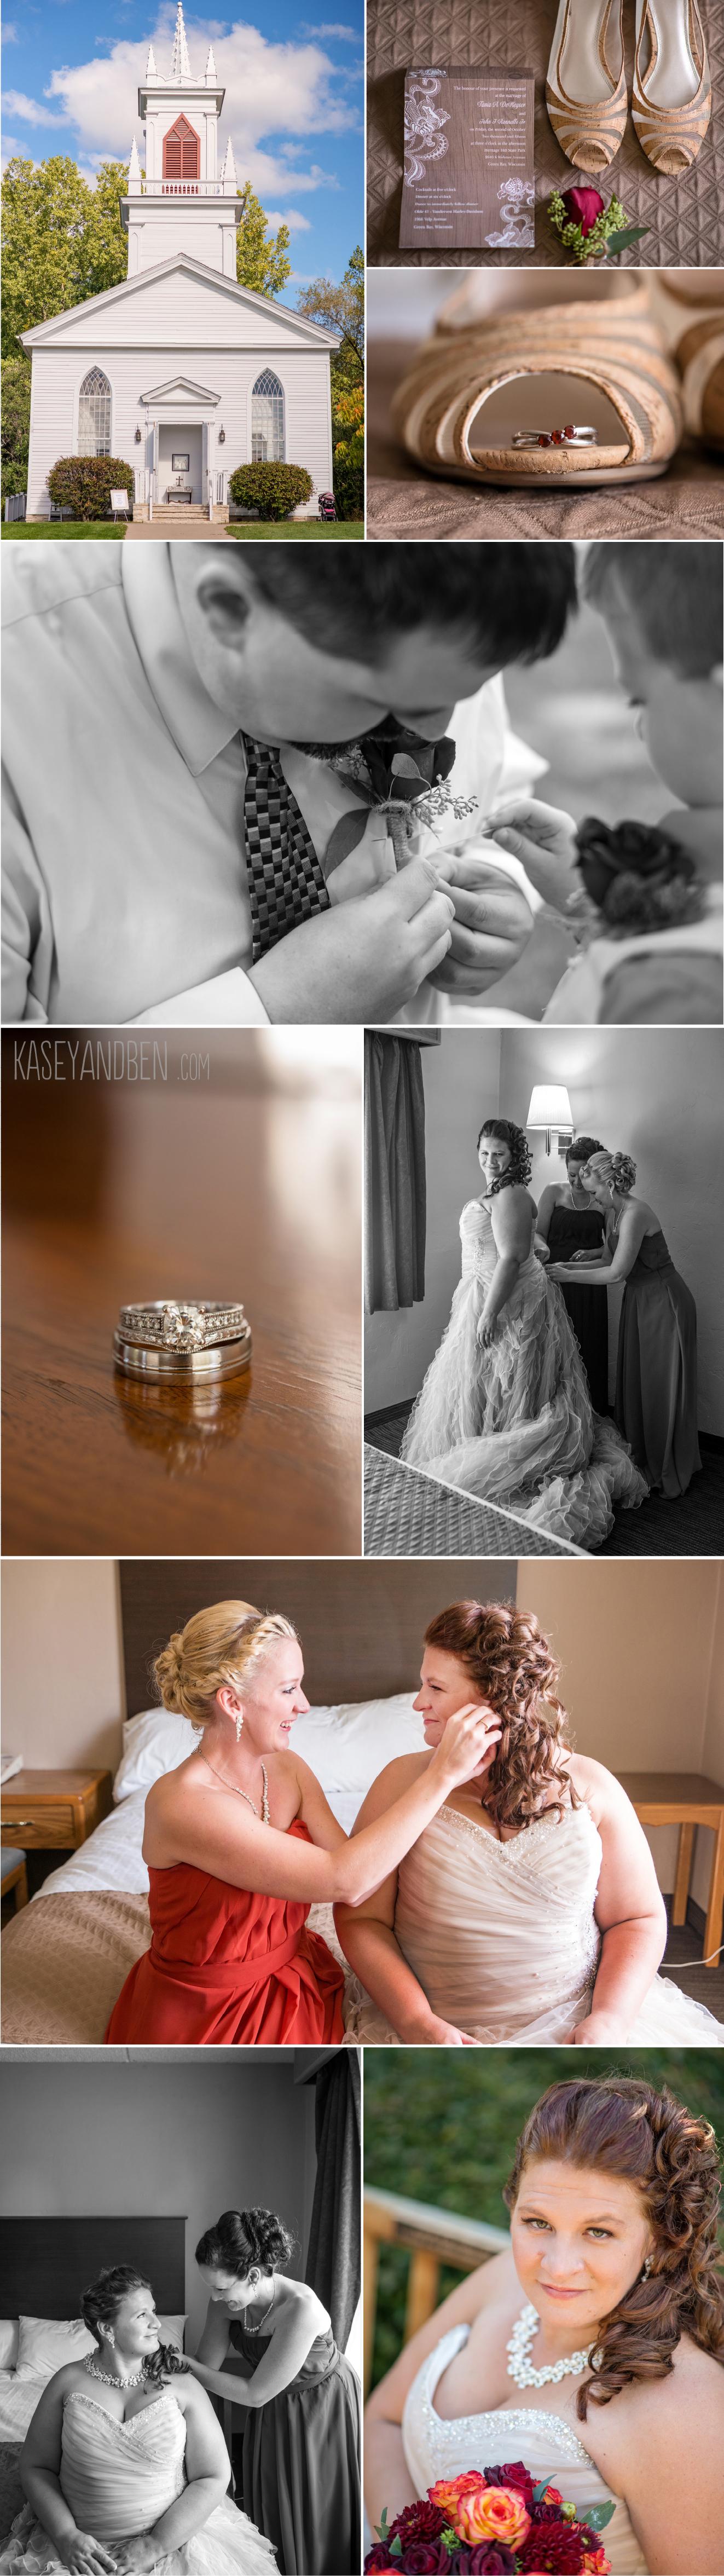 Heritage-Hill-Green-Bay-Wedding-Photographer-Olde-41-Vandervest-Children-Kids-Fall-Wisconsin-1